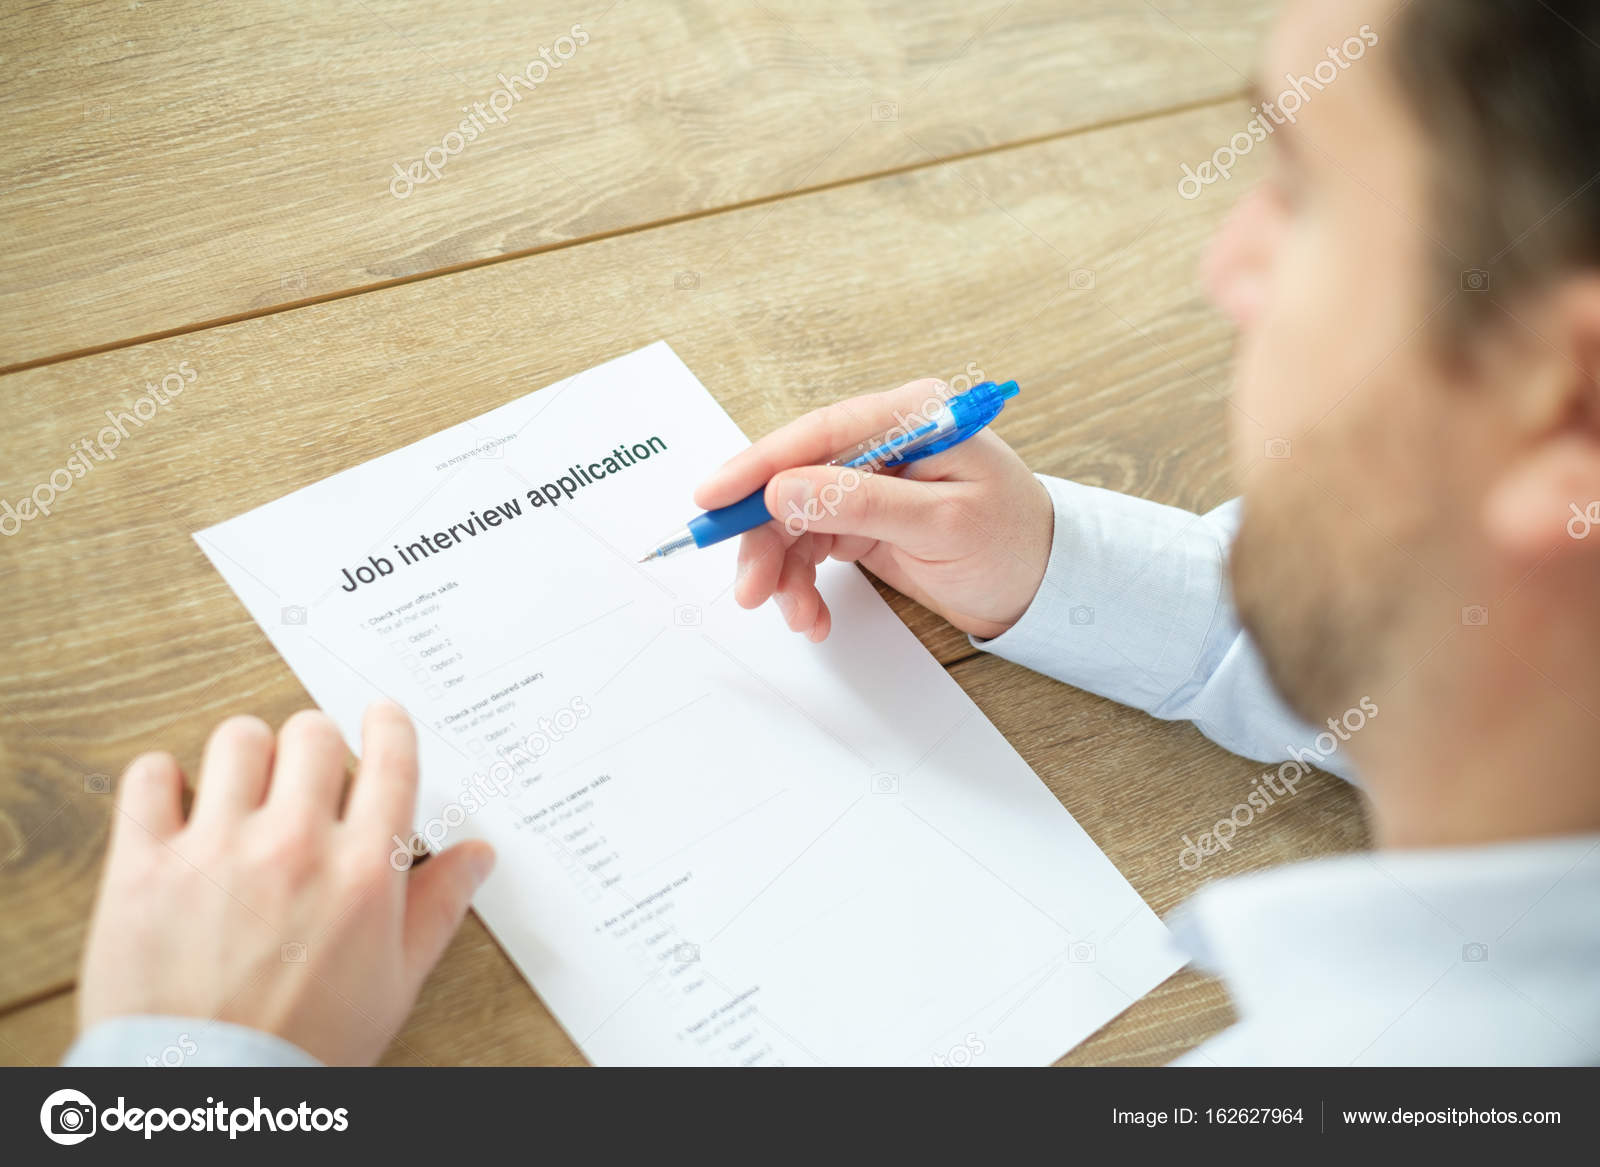 sollicitatiebrief beantwoorden Man die beantwoorden aan de sollicitatiebrief CV voor de  sollicitatiebrief beantwoorden